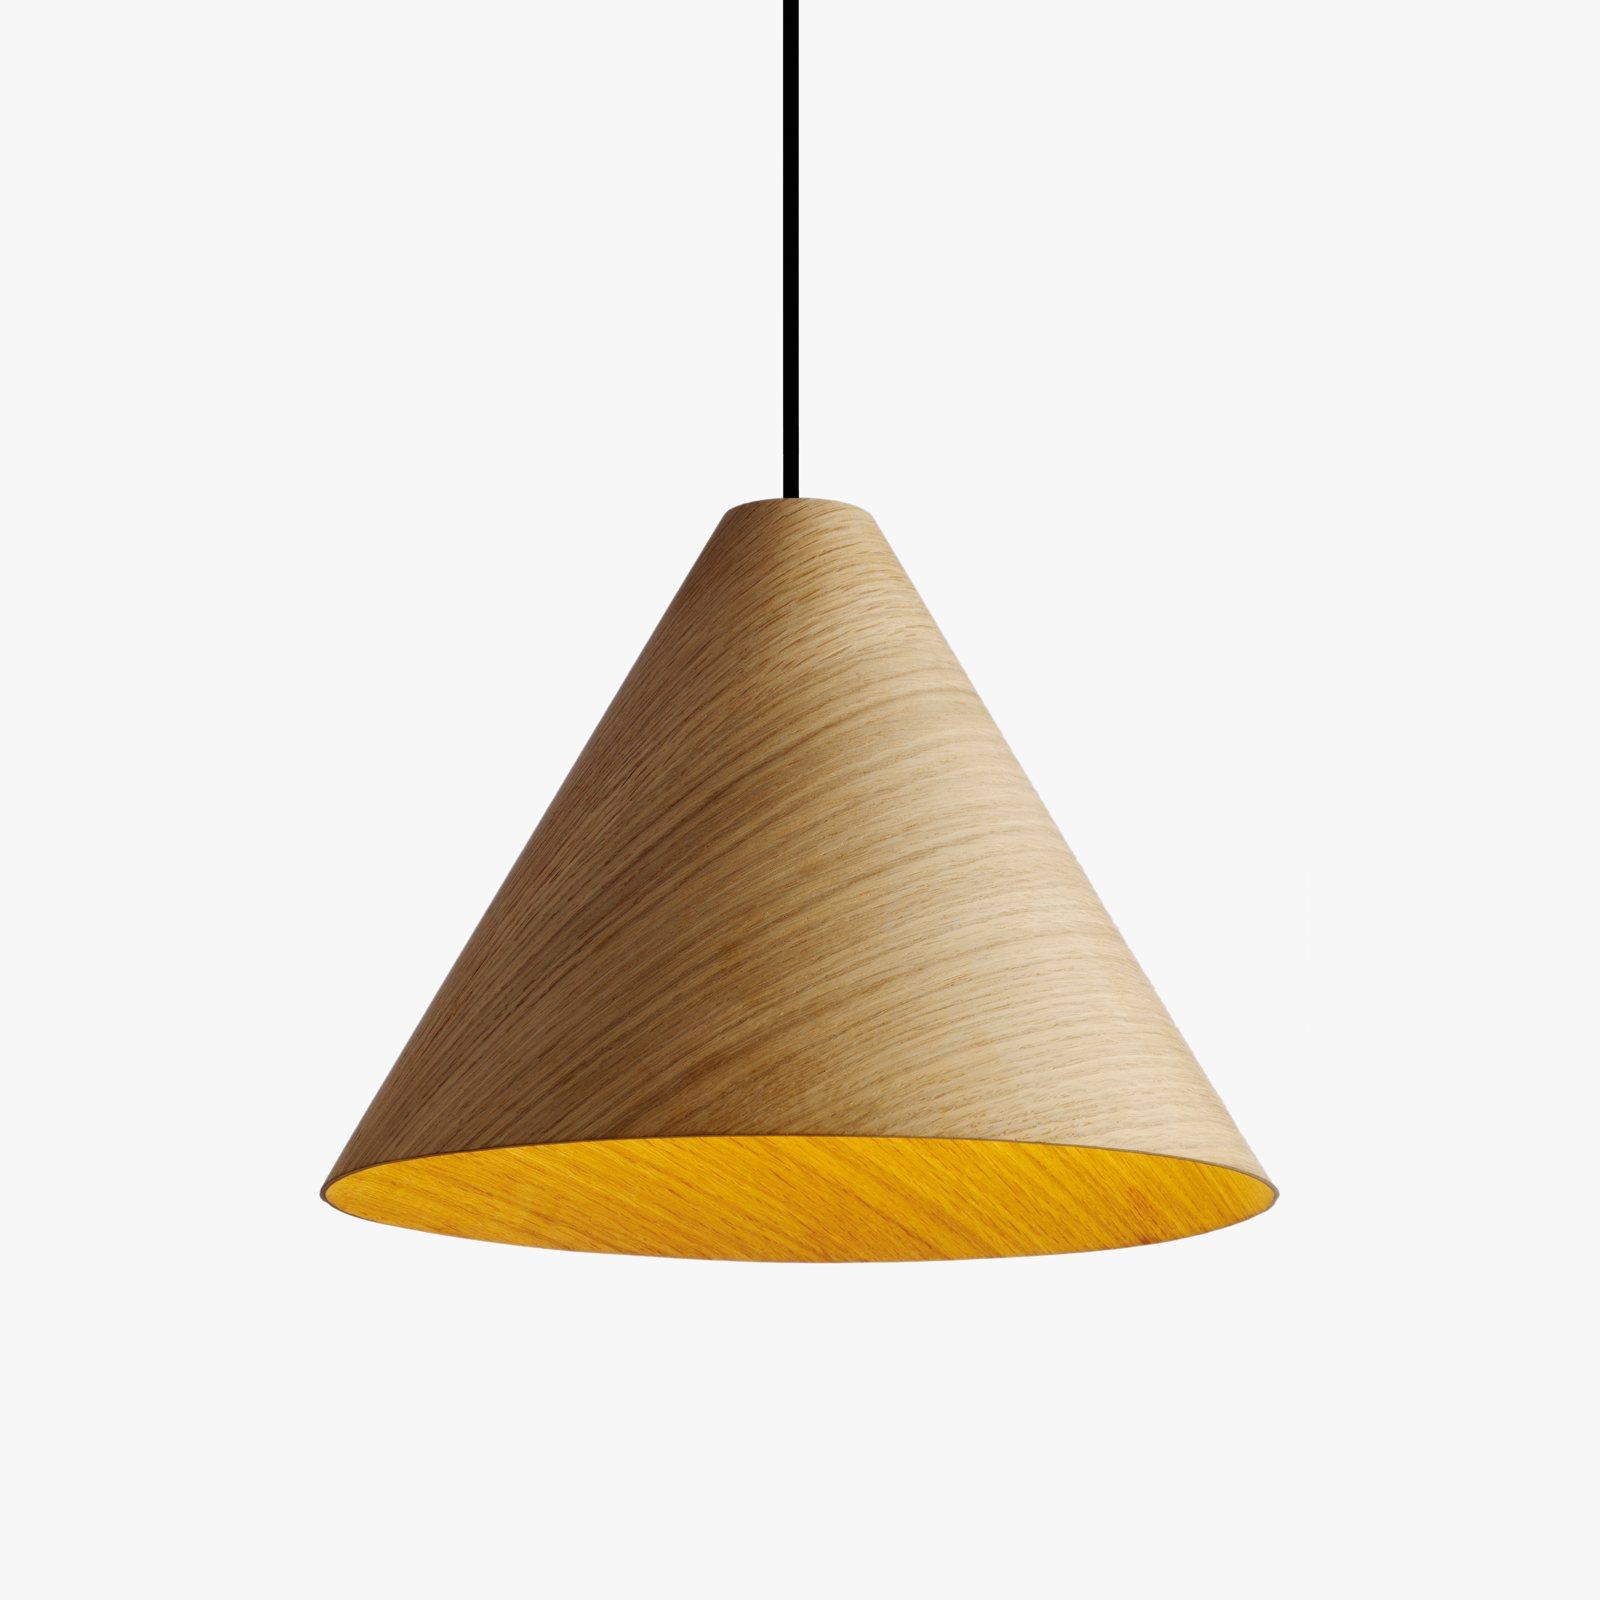 30 degrees pendant lamp with cord set by studio johan van hengel for